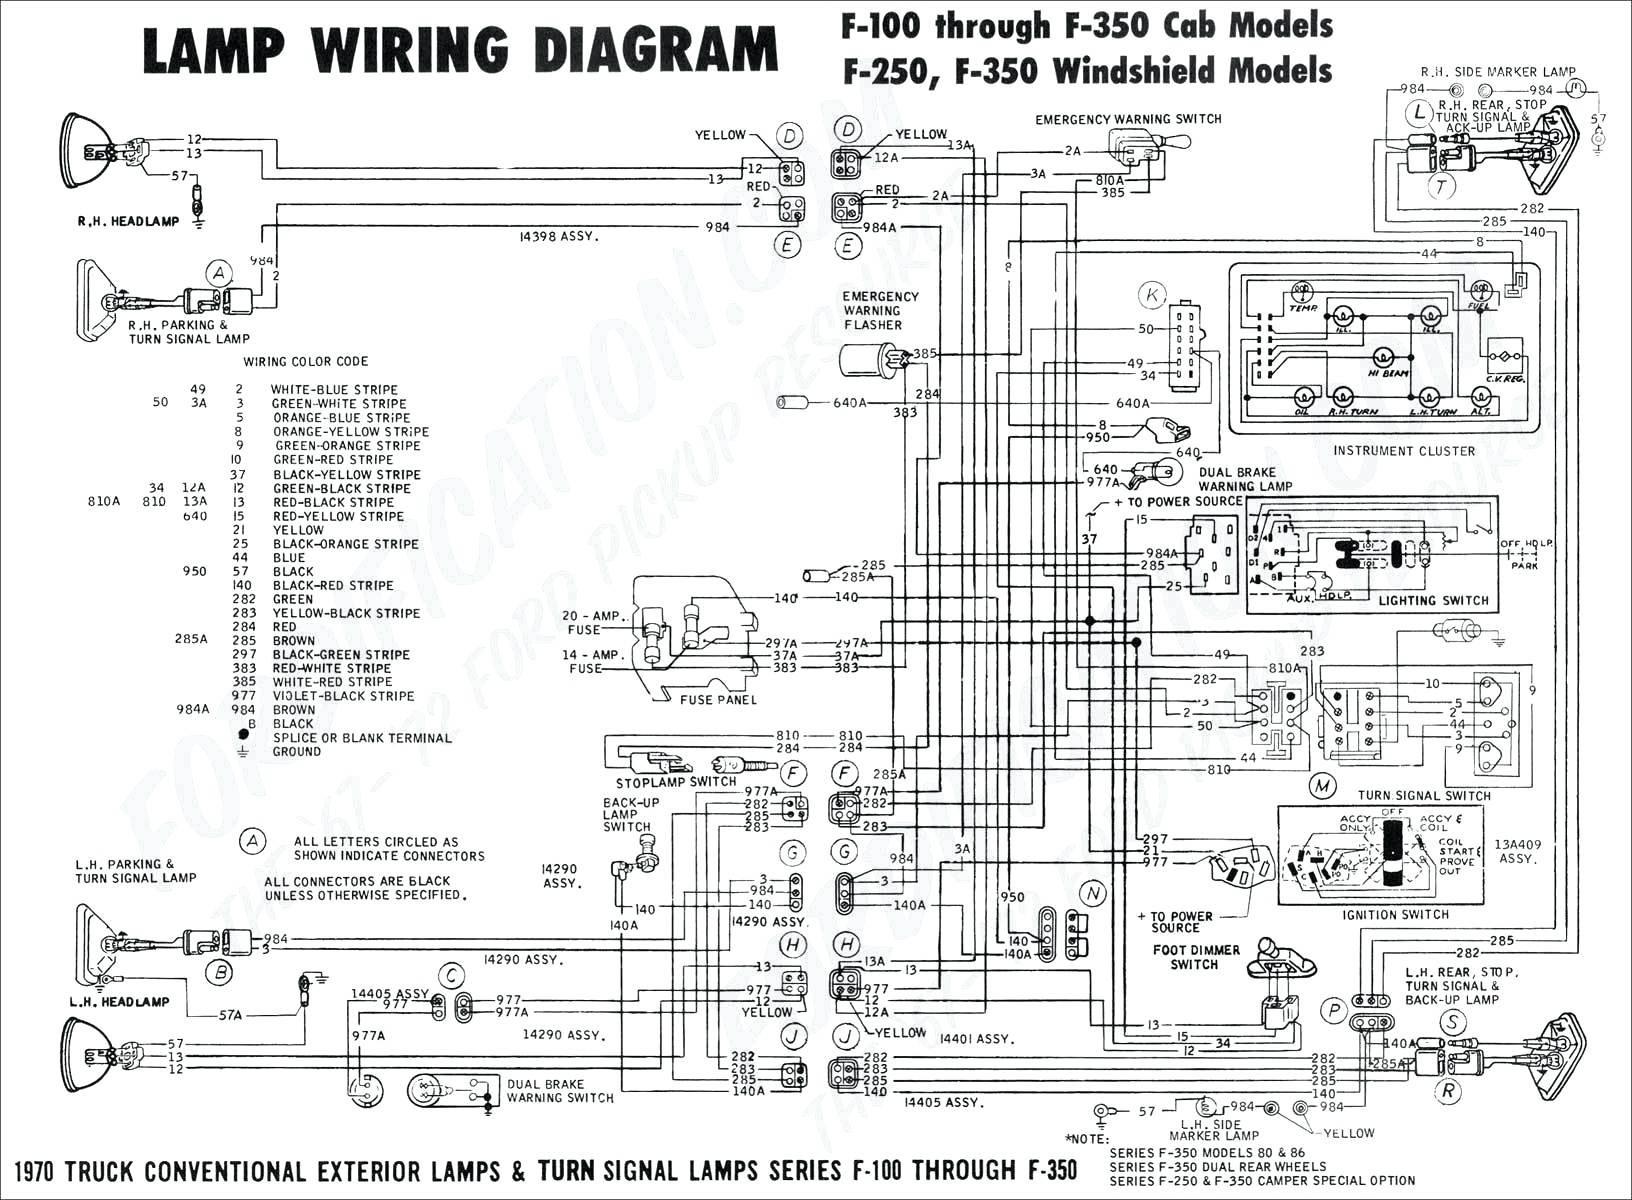 2006 Honda Civic Engine Diagram 1999 Honda Accord Radio Wiring Diagram Simple Also Honda Civic Radio Of 2006 Honda Civic Engine Diagram